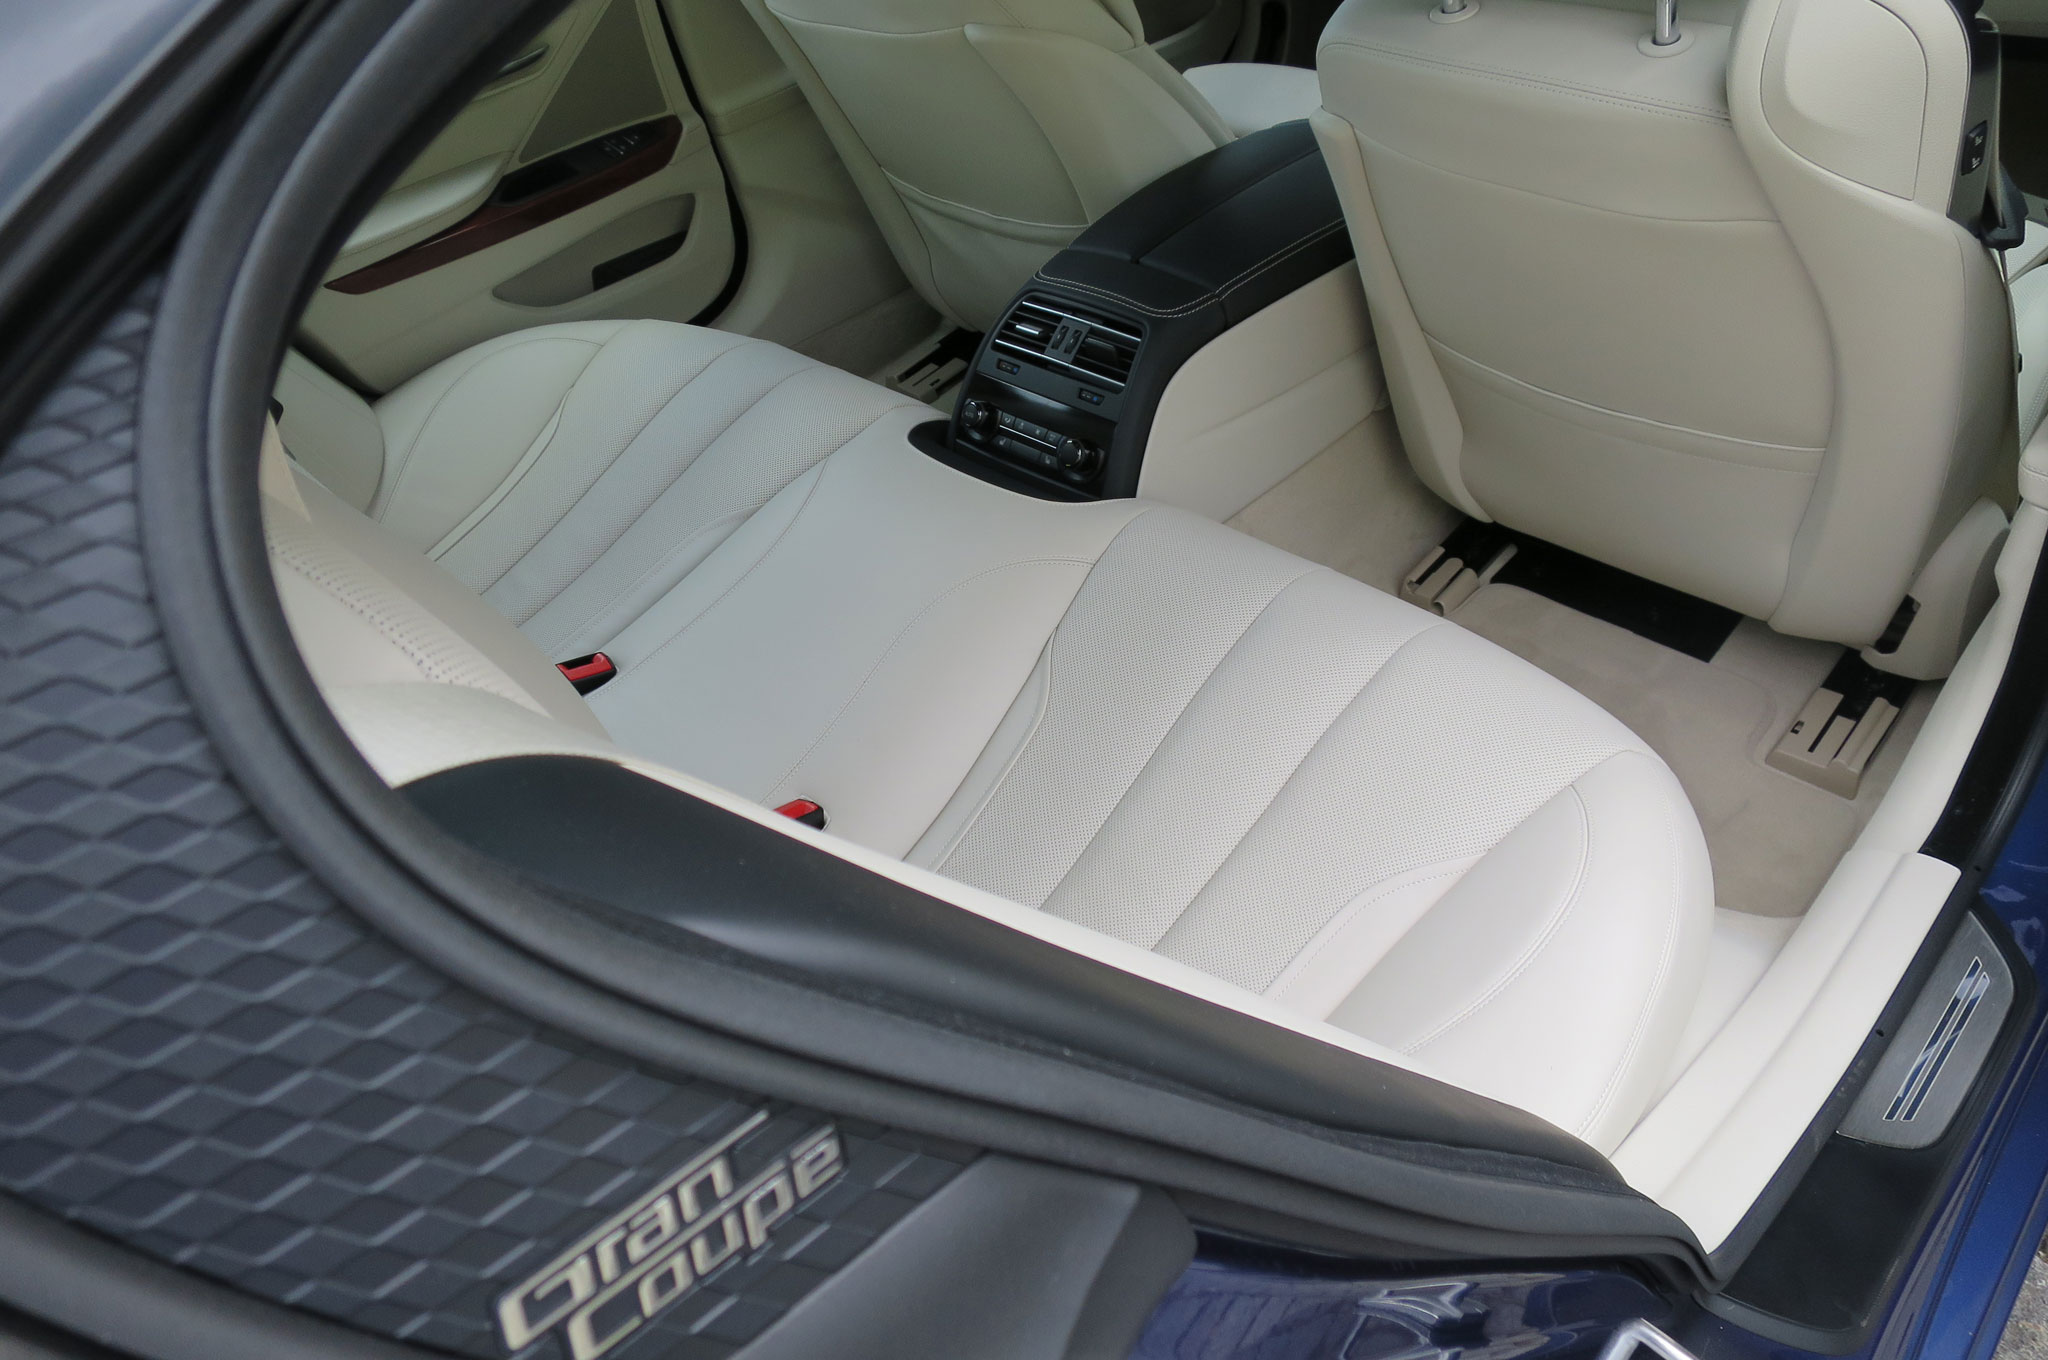 2015-bmw-alpina-b6-xdrive-gran-coupe-interior-rear-seat.jpg